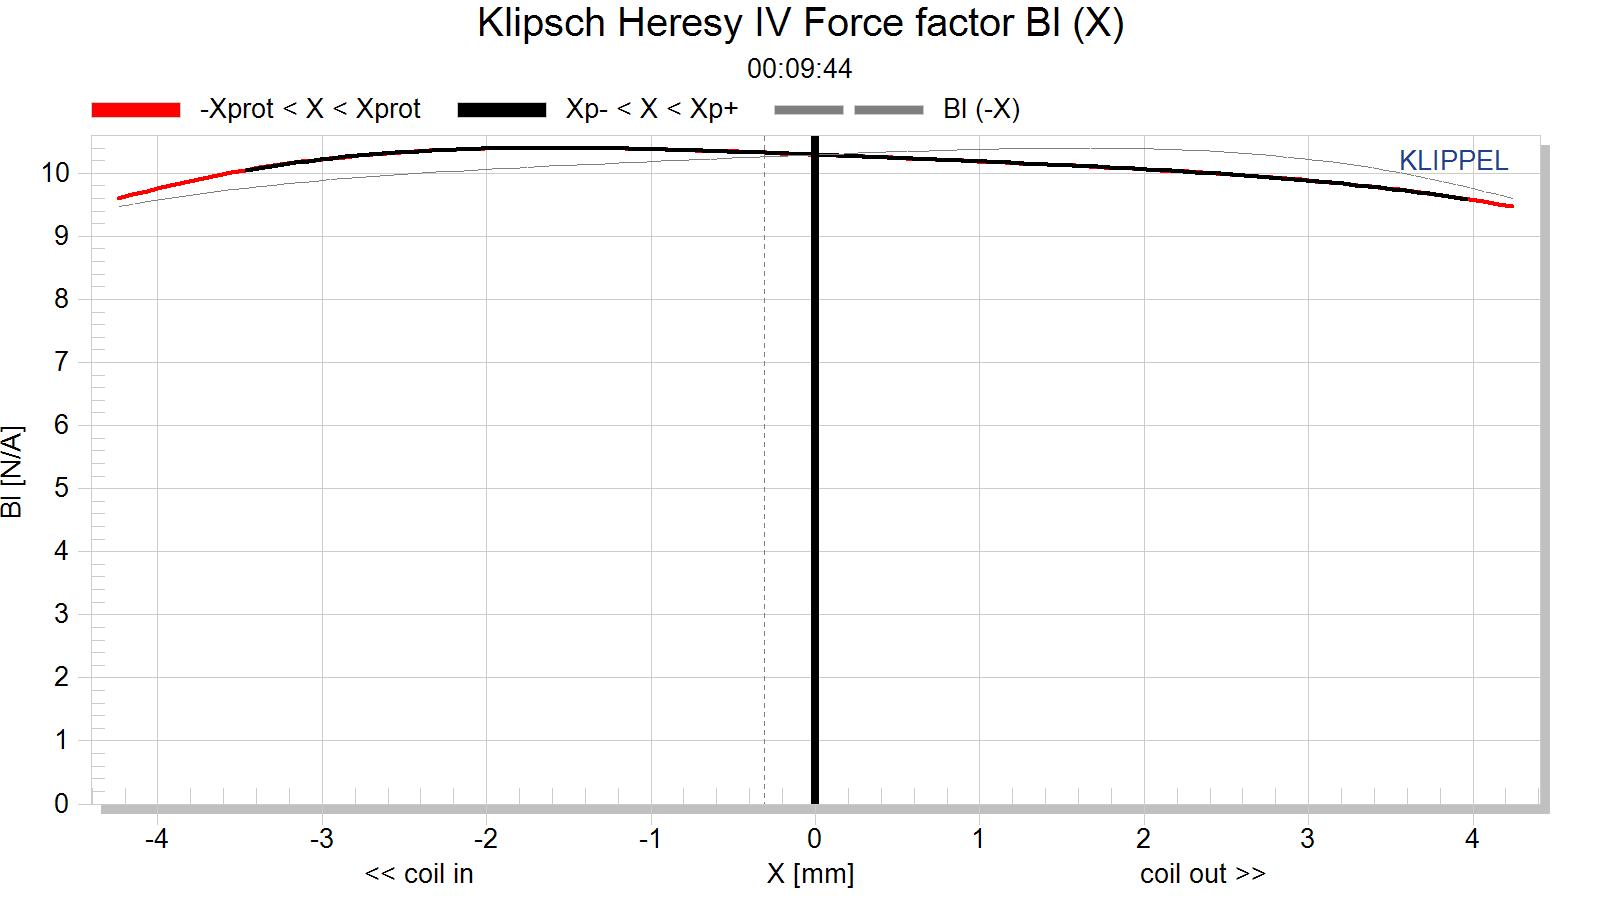 Klipsch Heresy IV Force factor Bl (X).png